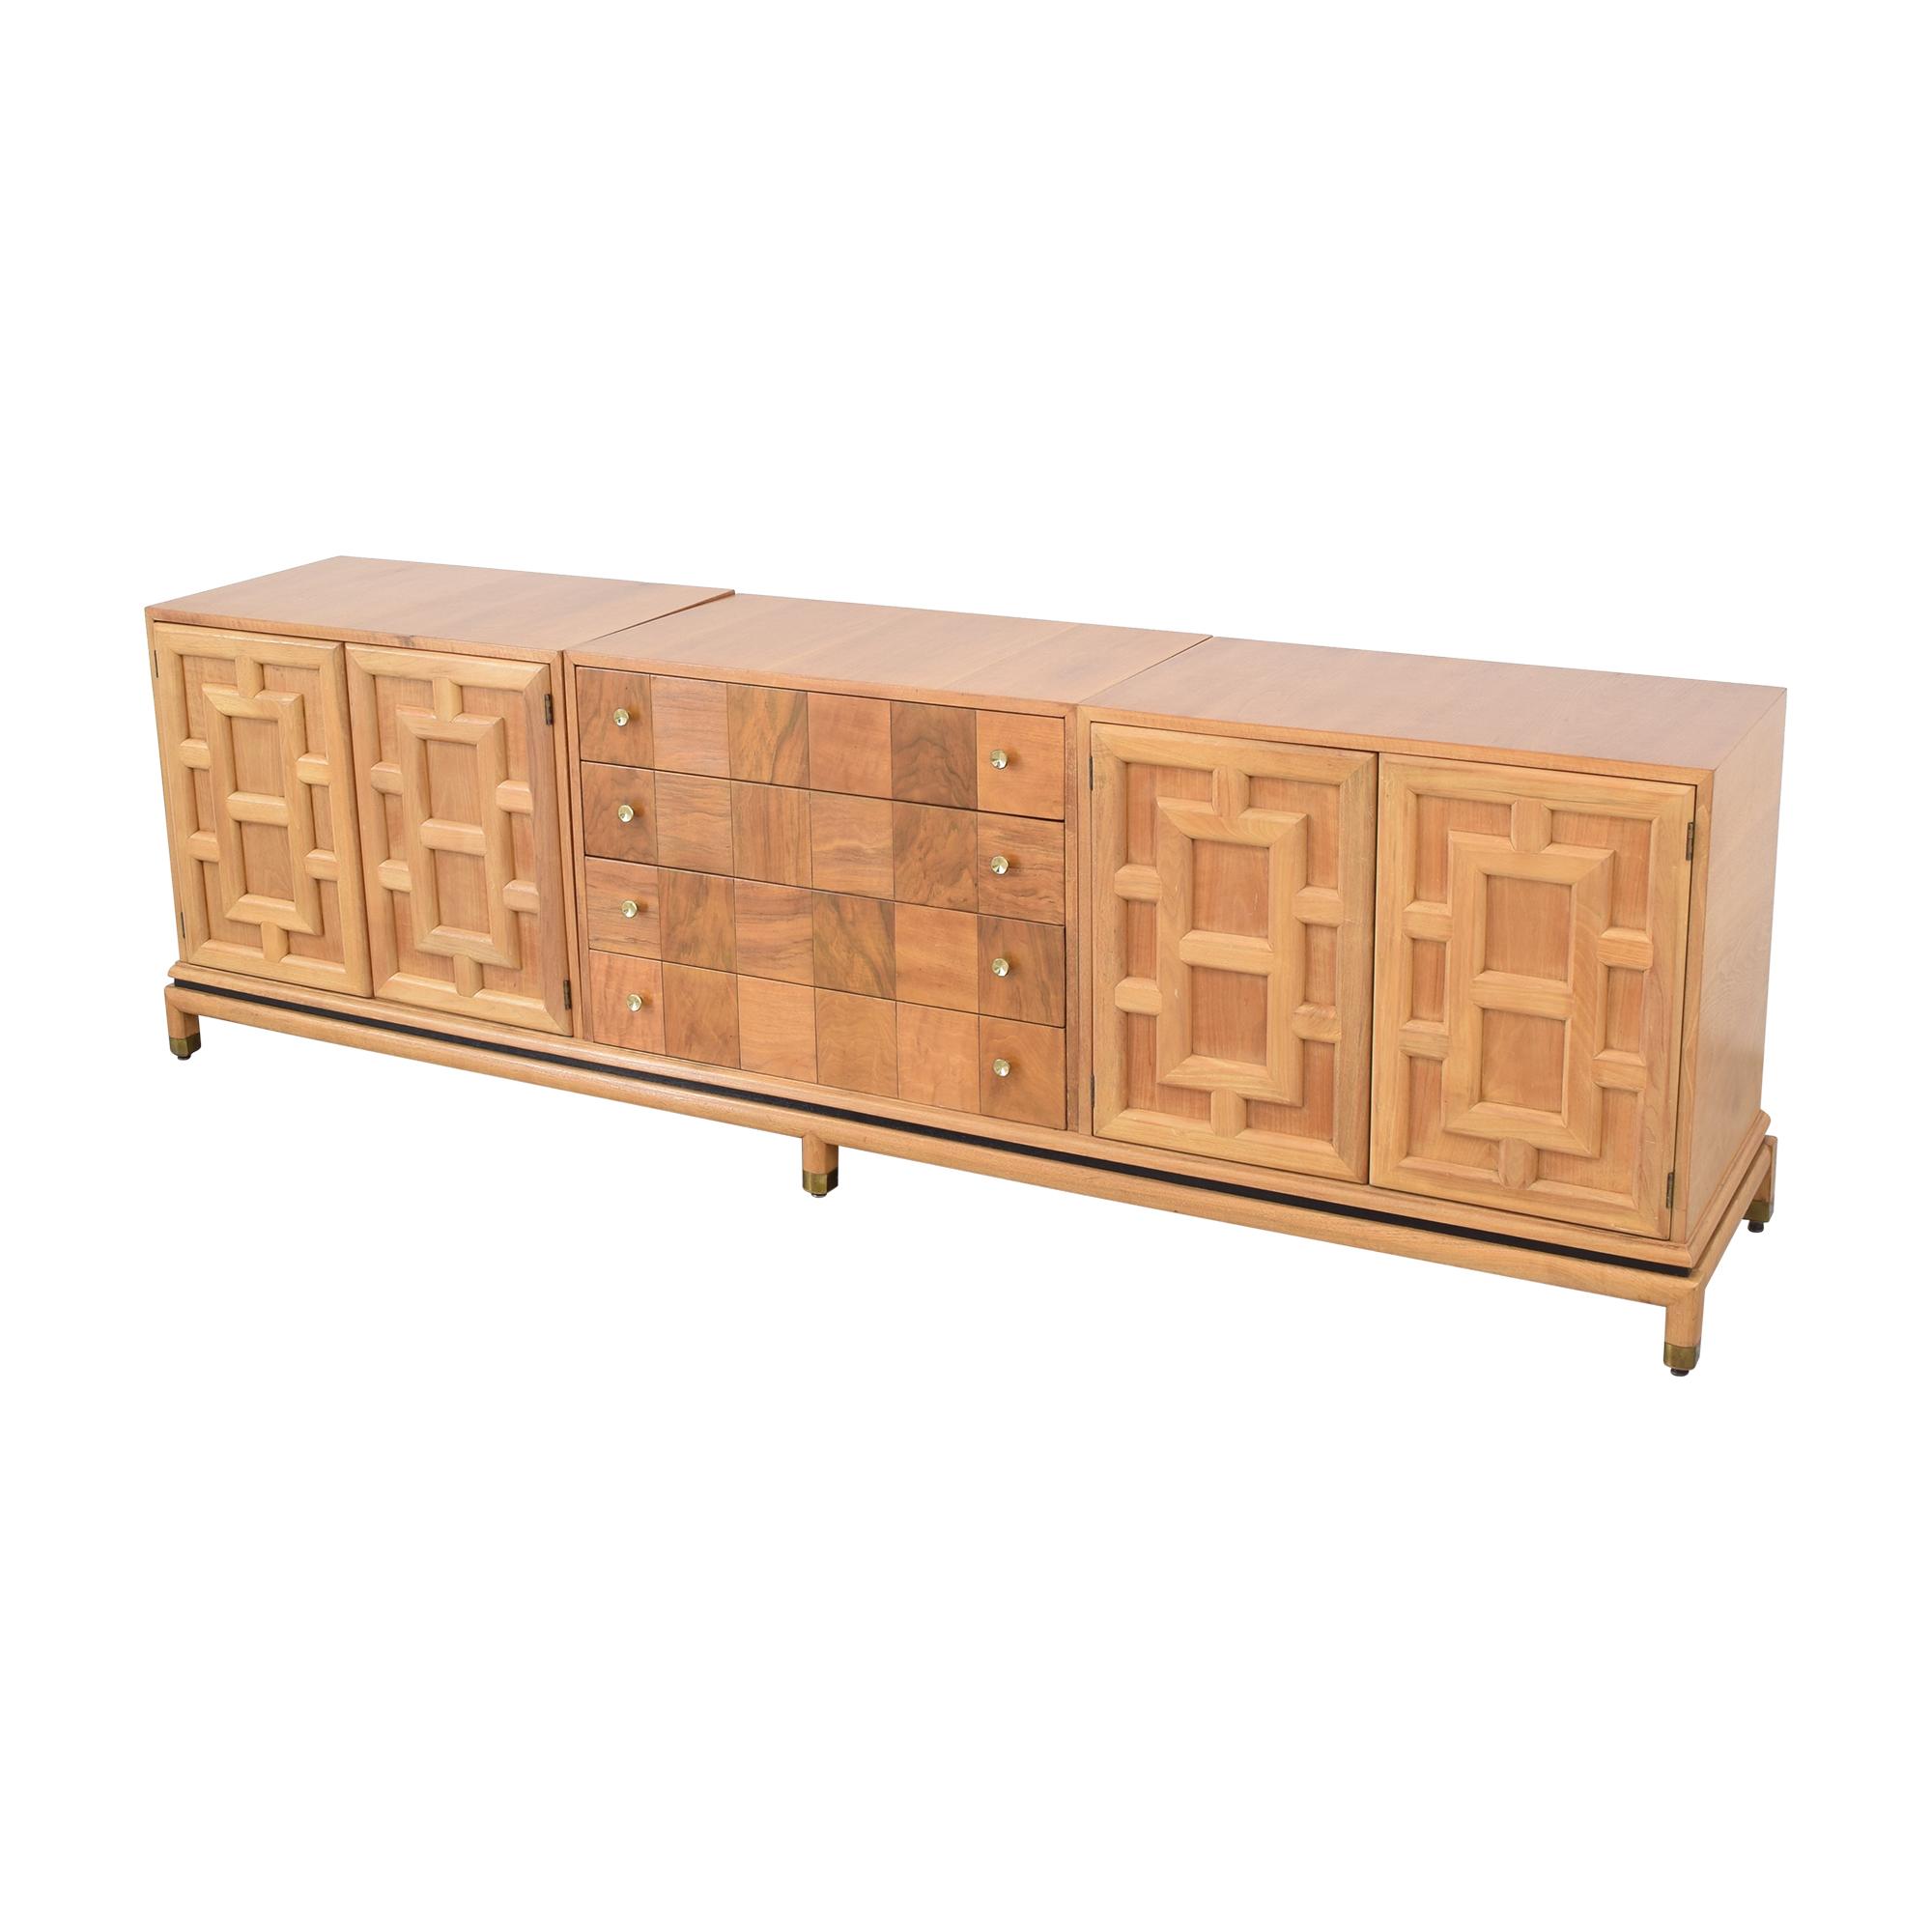 buy Johnson Furniture Johnson Furniture Geometric Sideboard online